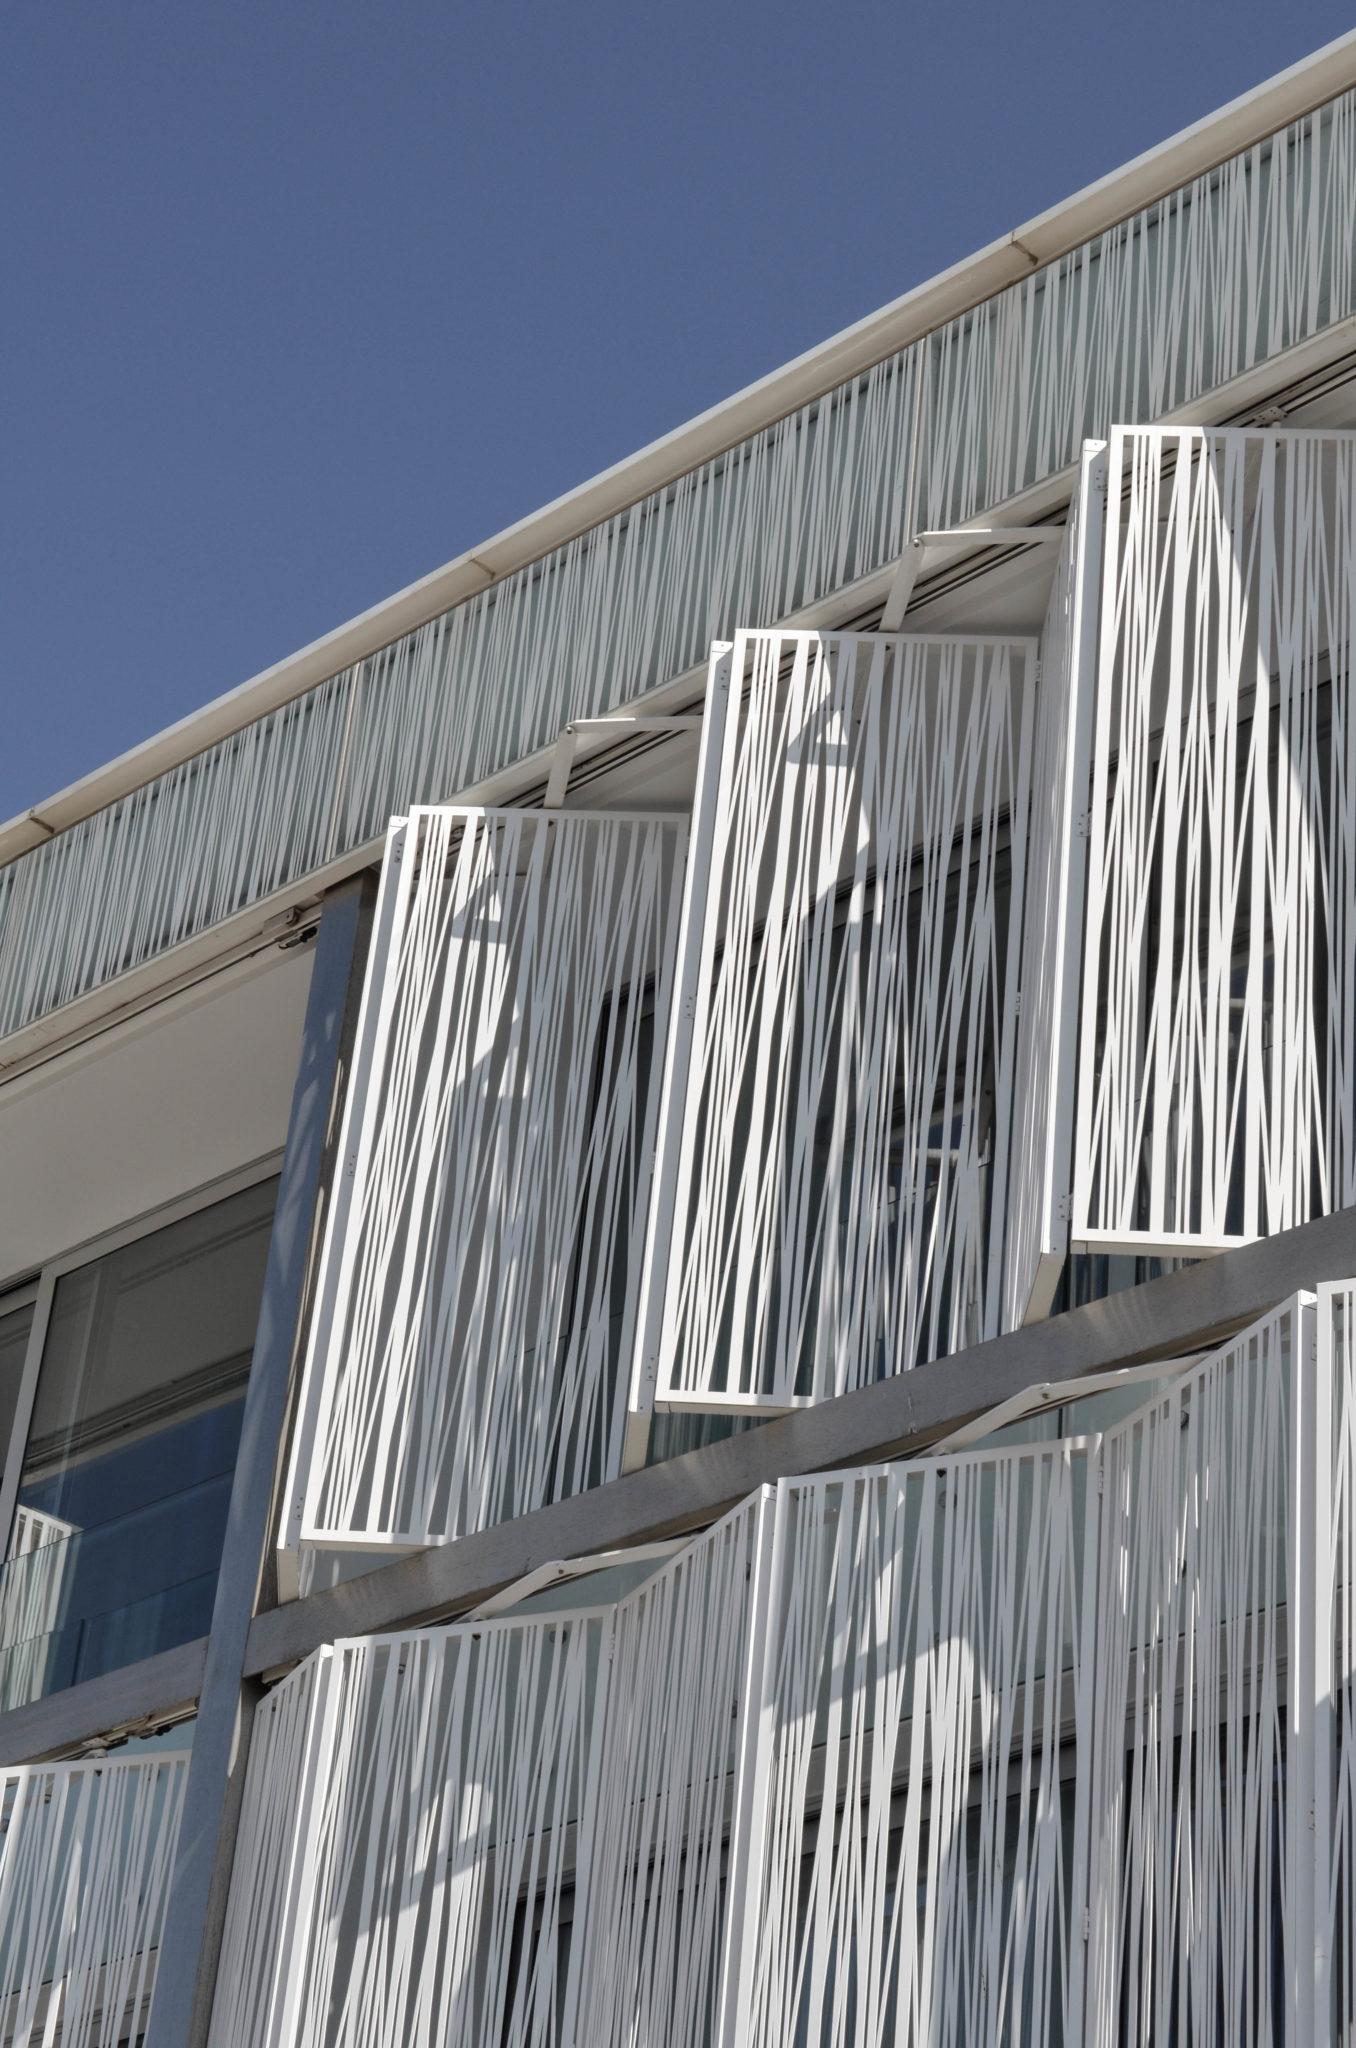 Altis-Belem-Hotel-Lissabon-Review-Fassade-Fenster